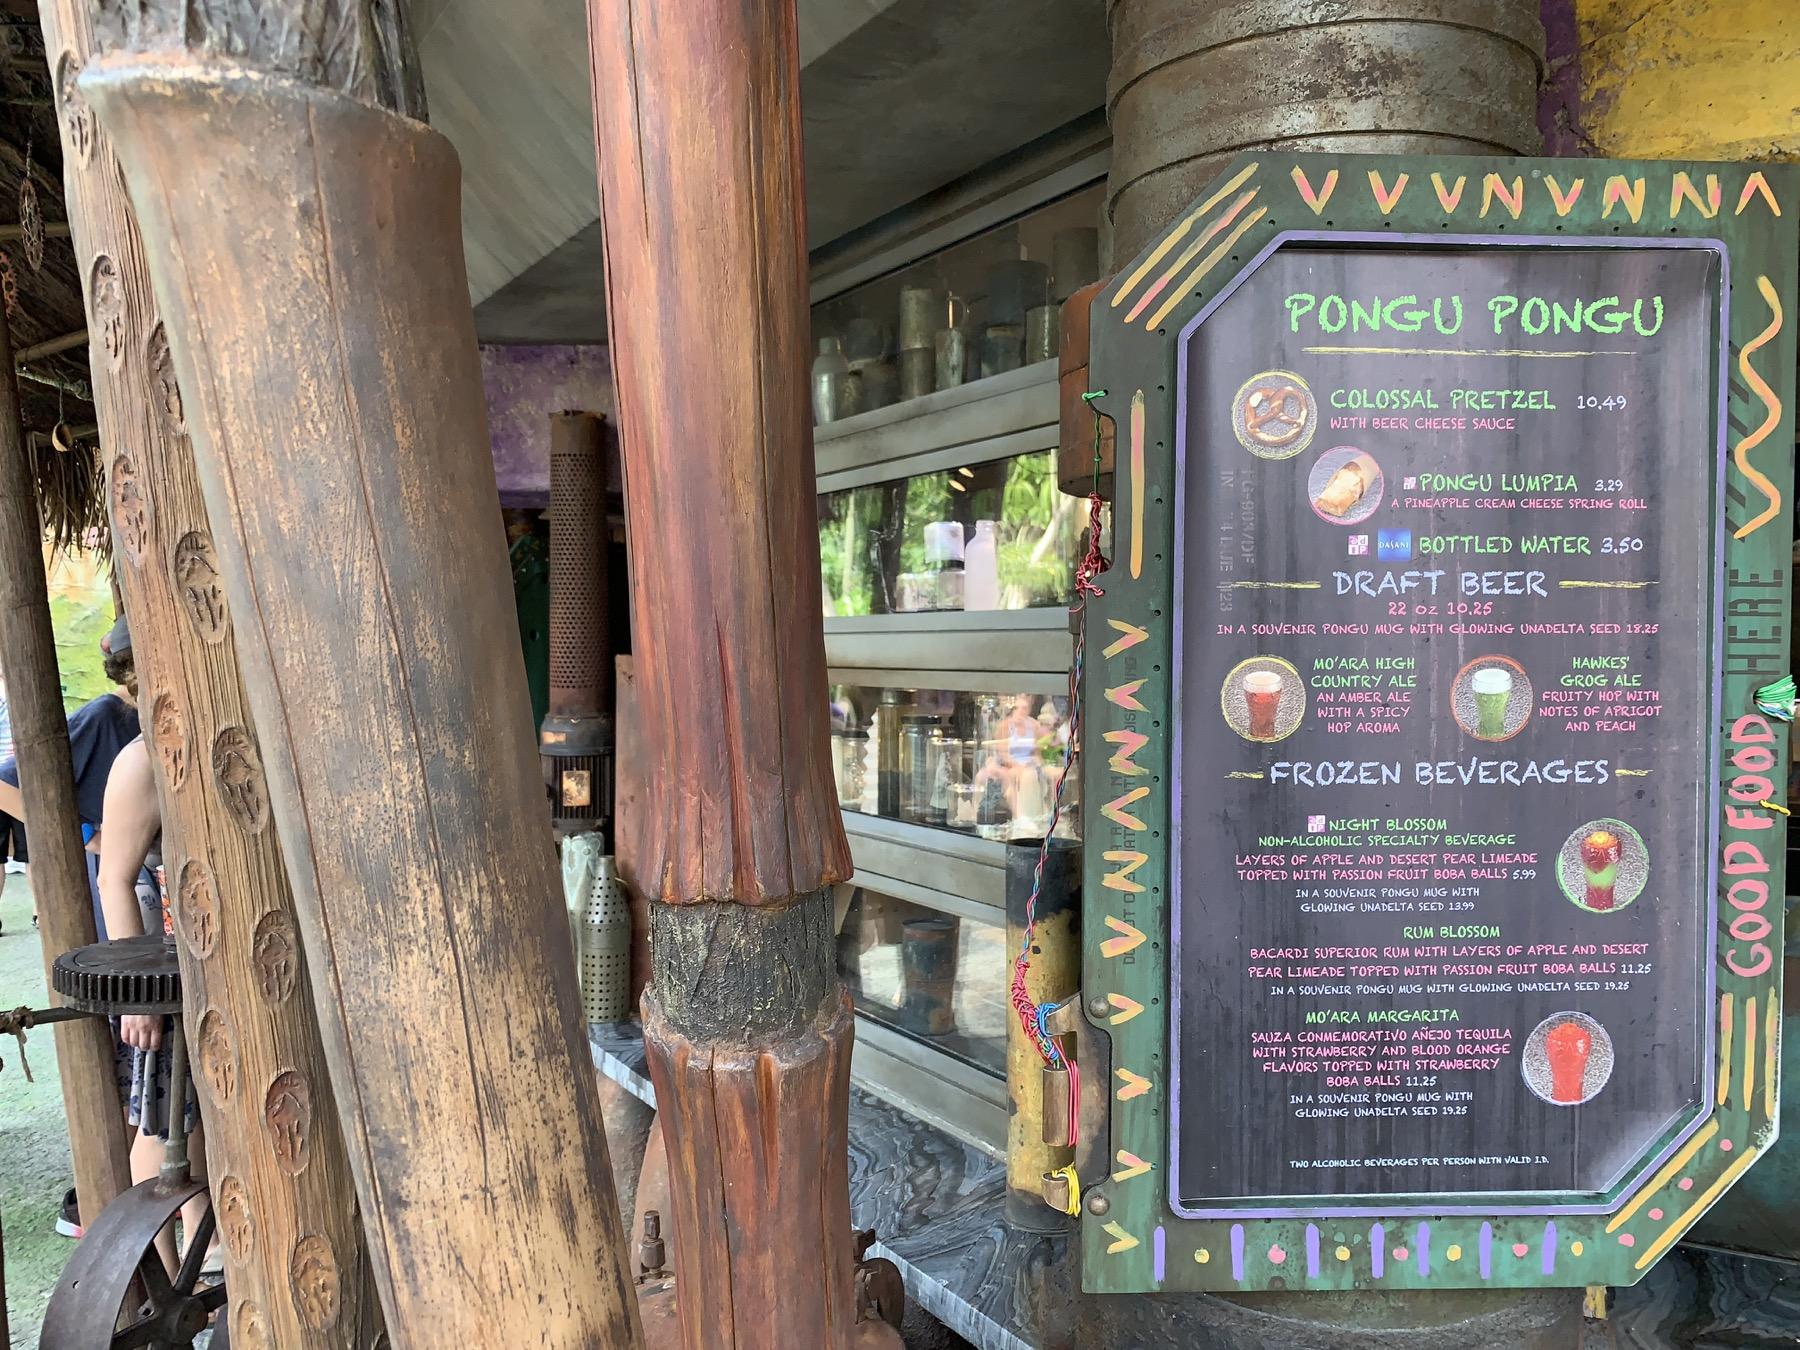 pongu pongu 2 where to drink at animal kingdom.jpg